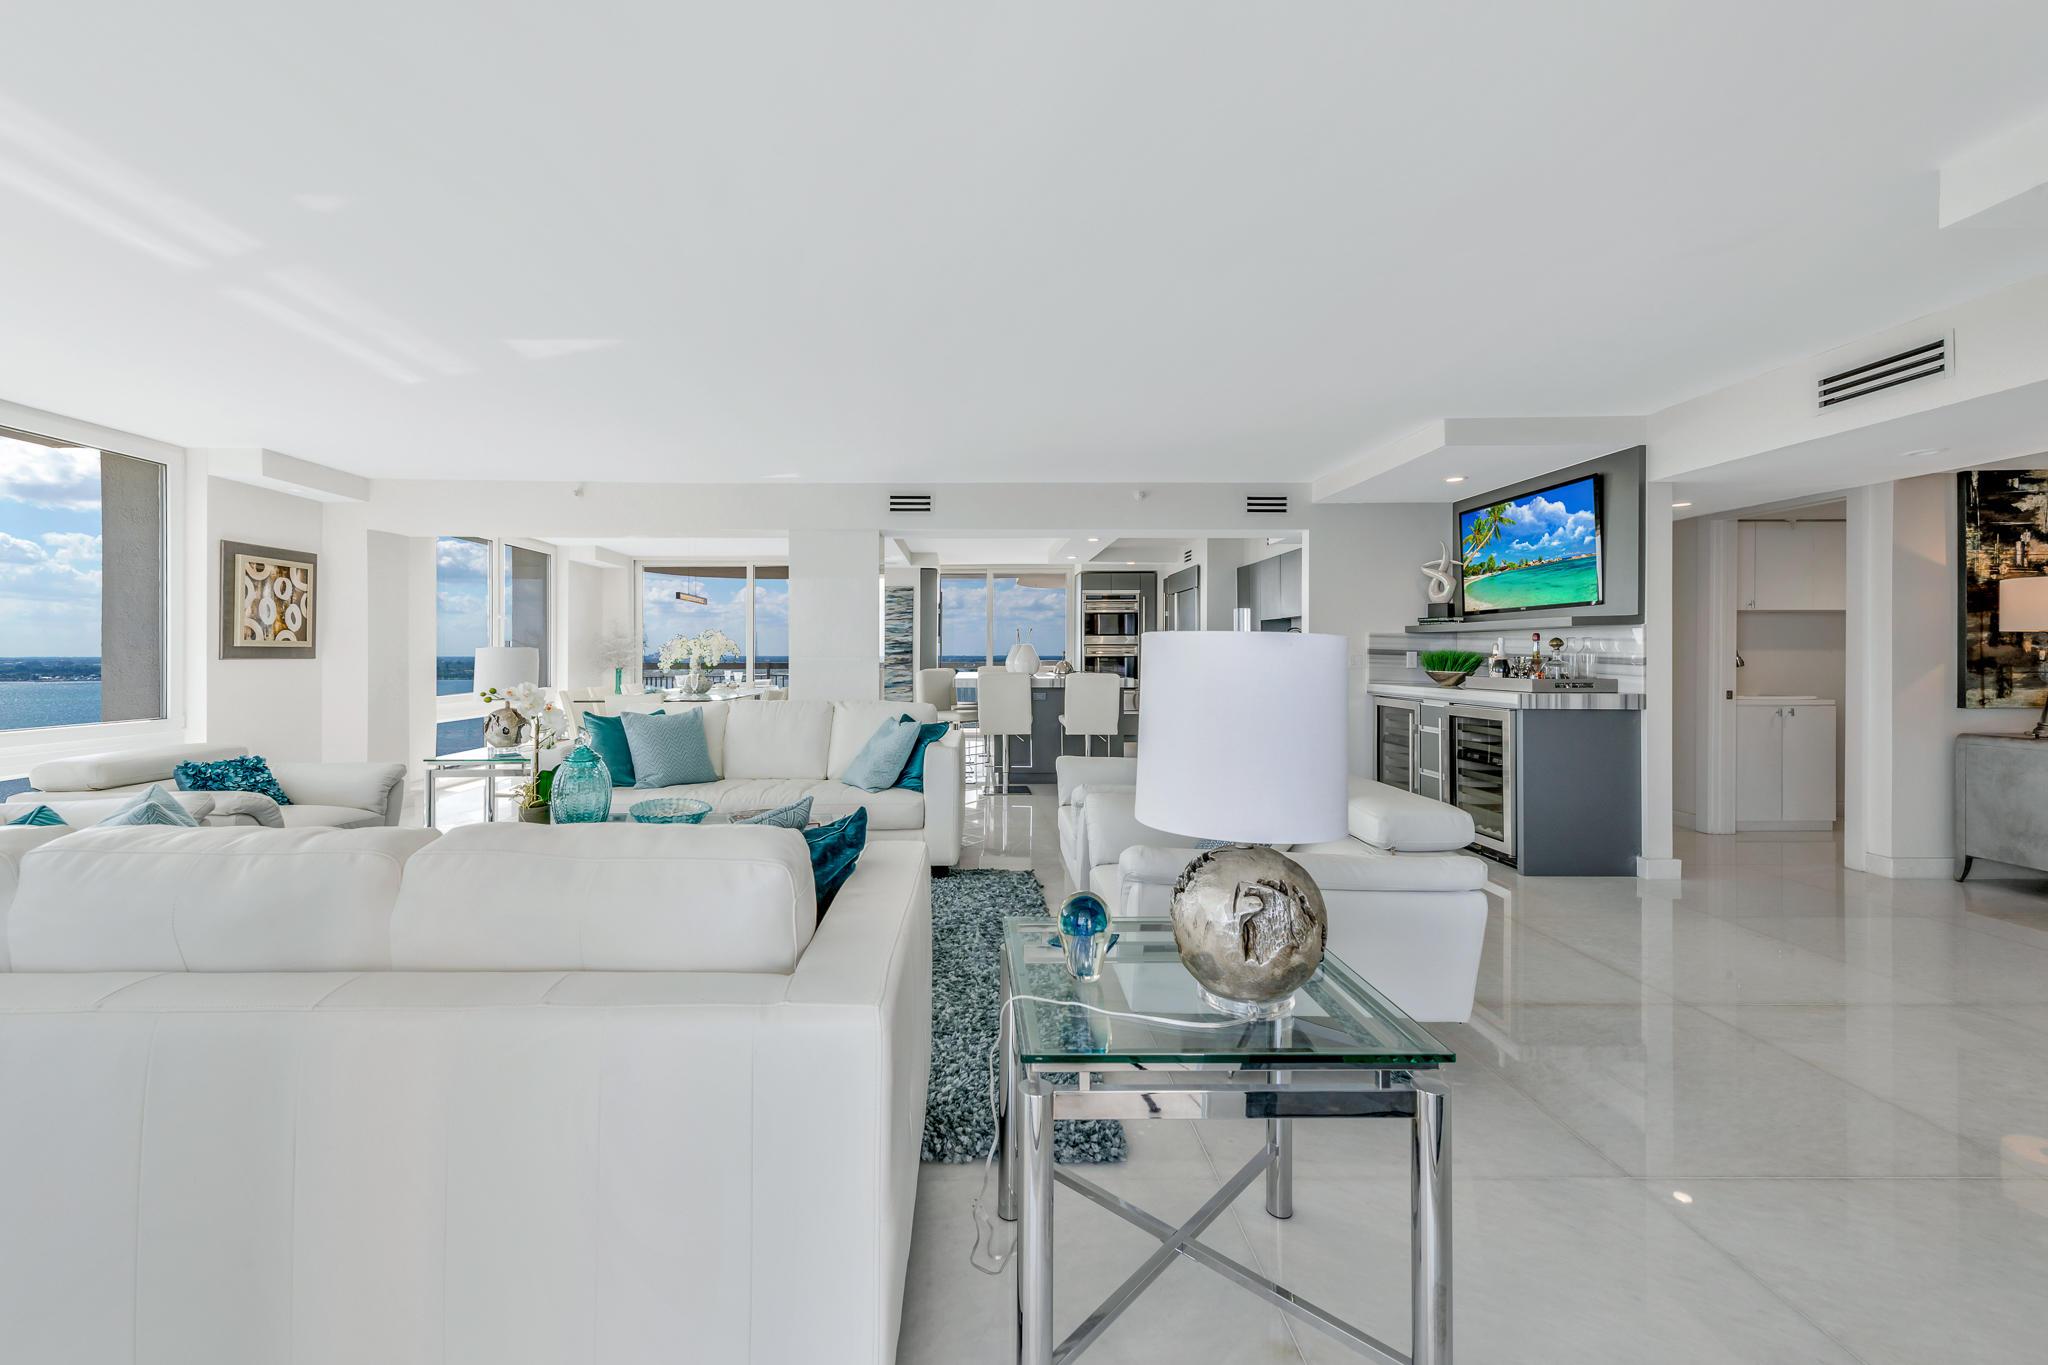 5380 Ocean Drive 19h, Riviera Beach, Florida 33404, 3 Bedrooms Bedrooms, ,3.1 BathroomsBathrooms,A,Condominium,Ocean,RX-10478867